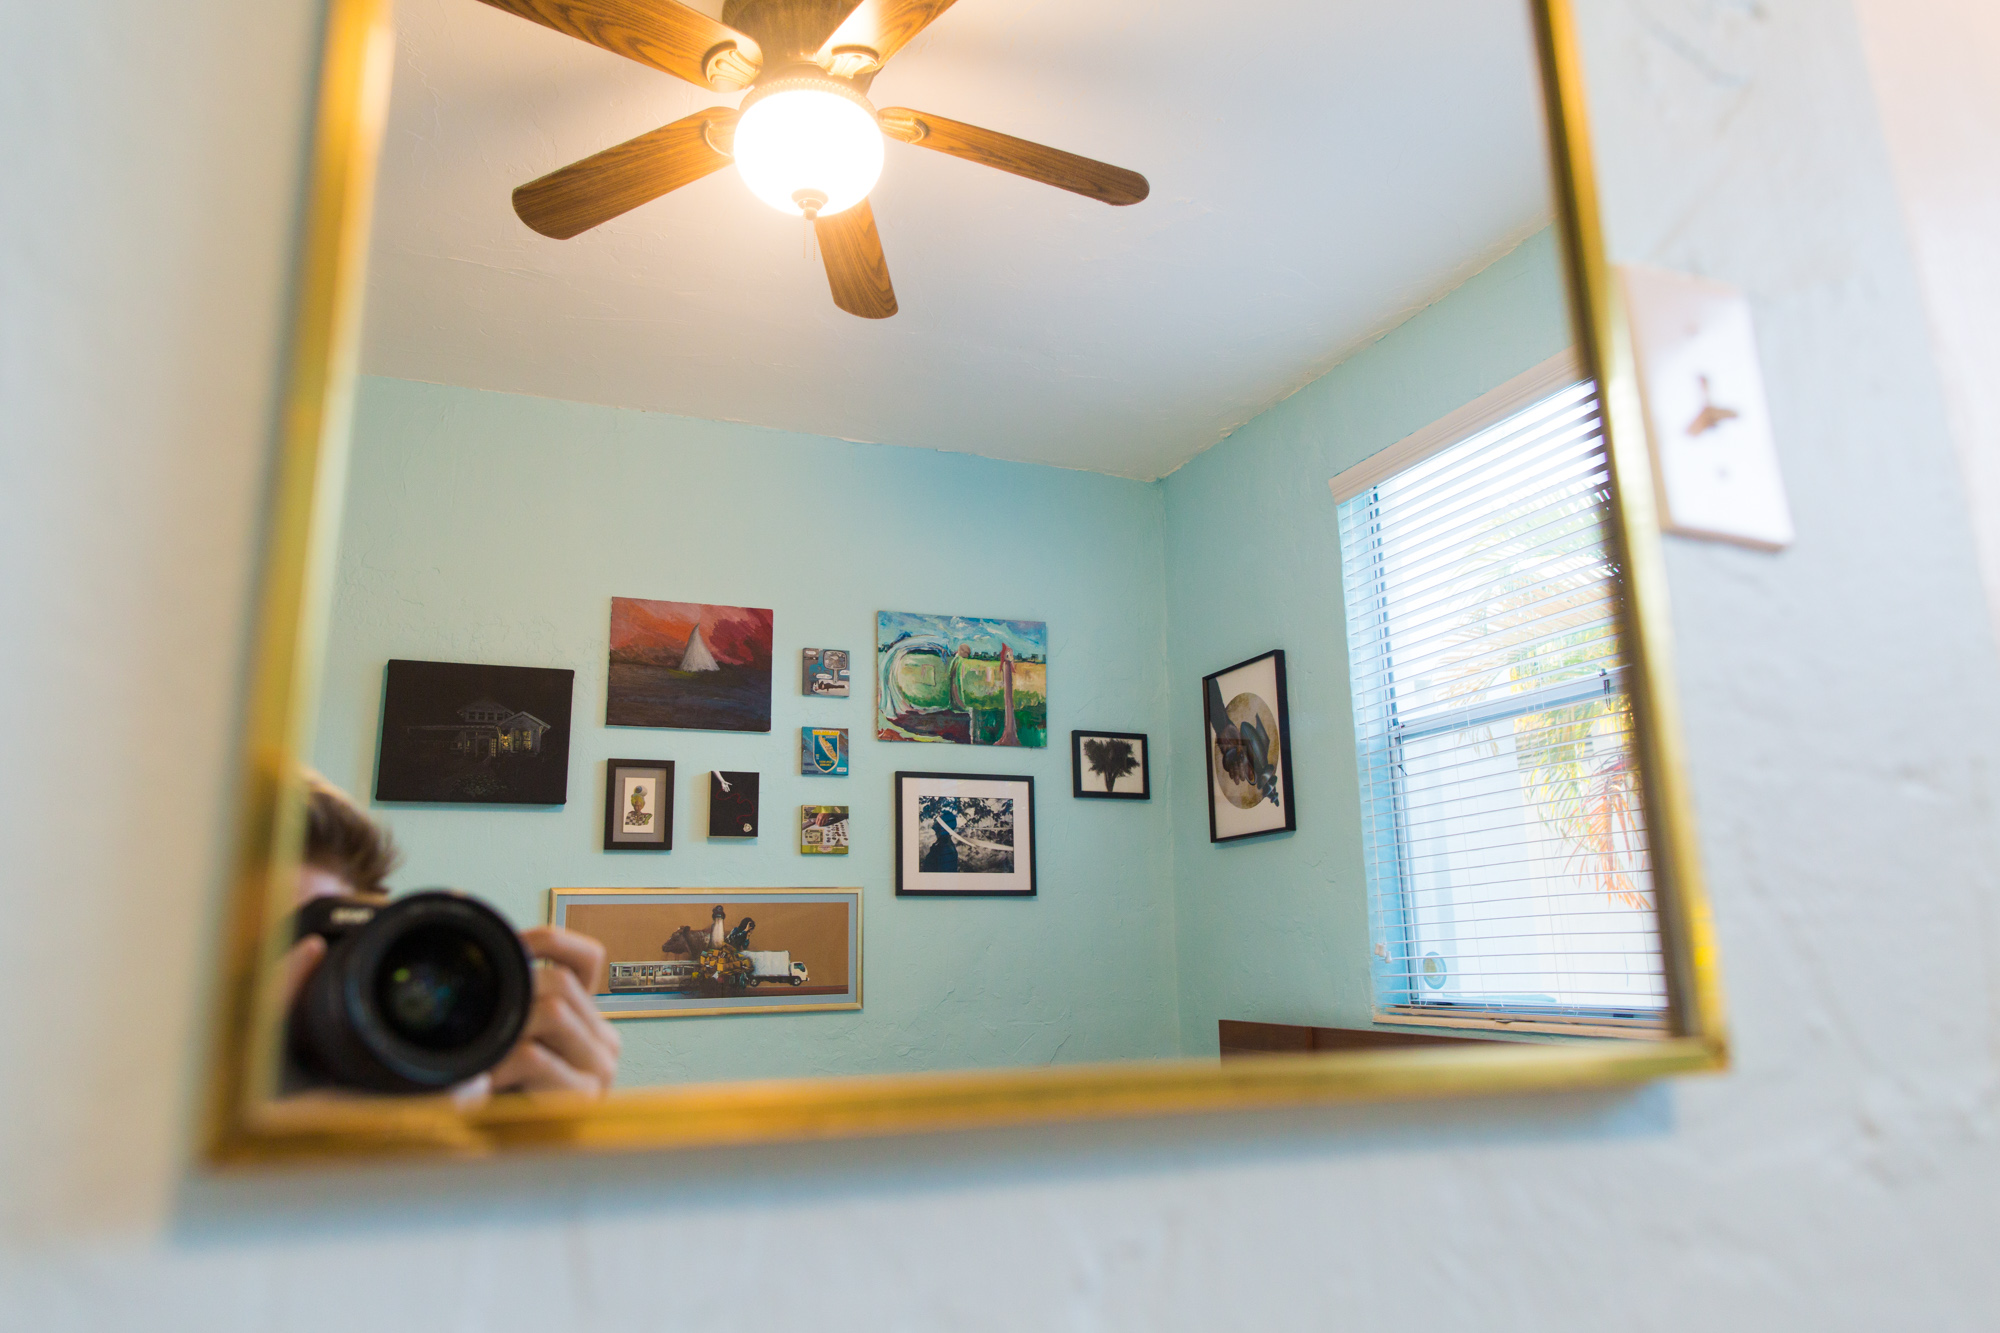 Salon wall of artwork reflected in bedroom mirror